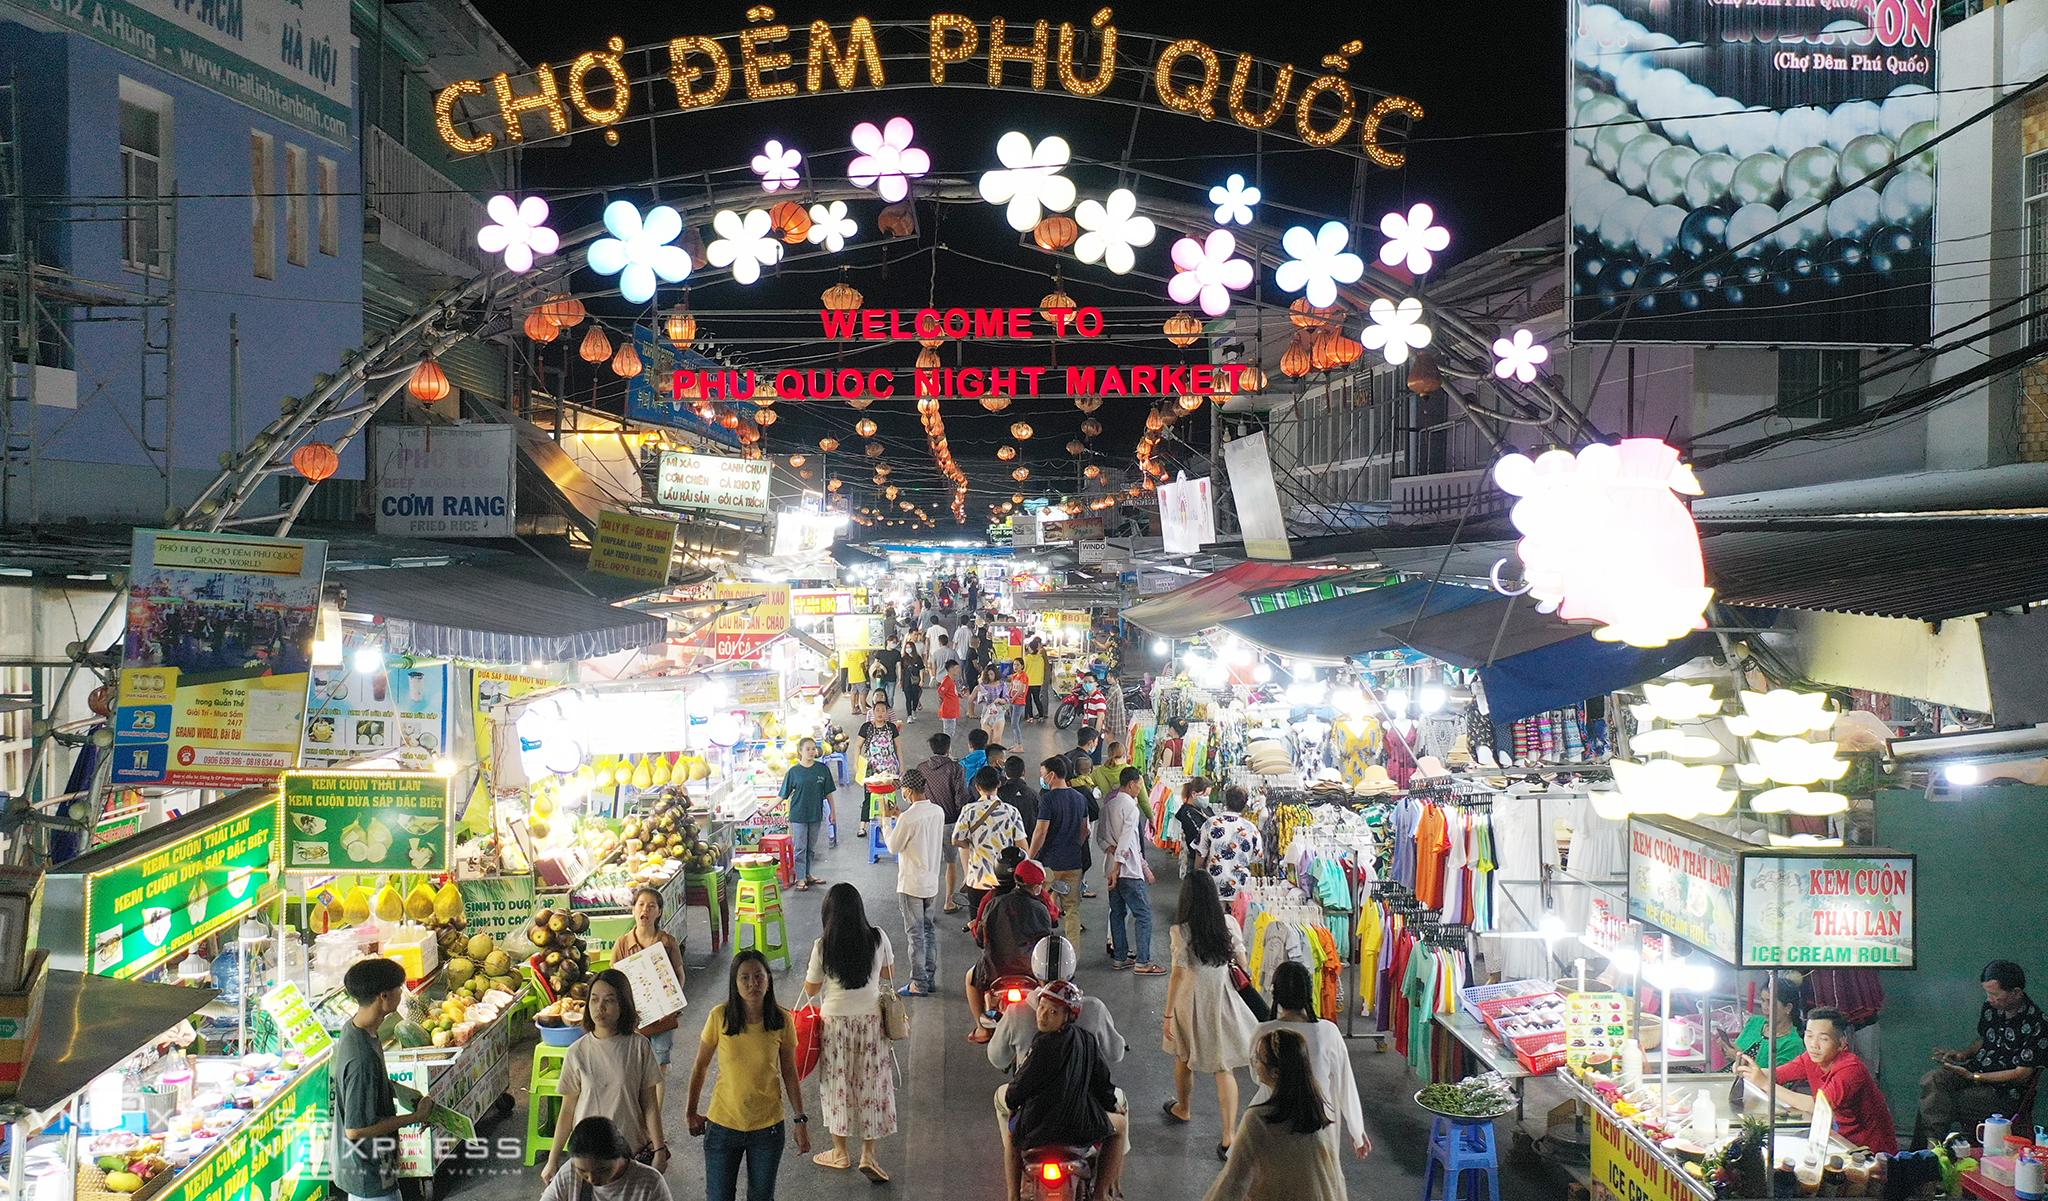 People walk at Phu Quoc night market, Janauary 2021. Photo by VnExpress/Ngoc Thanh.